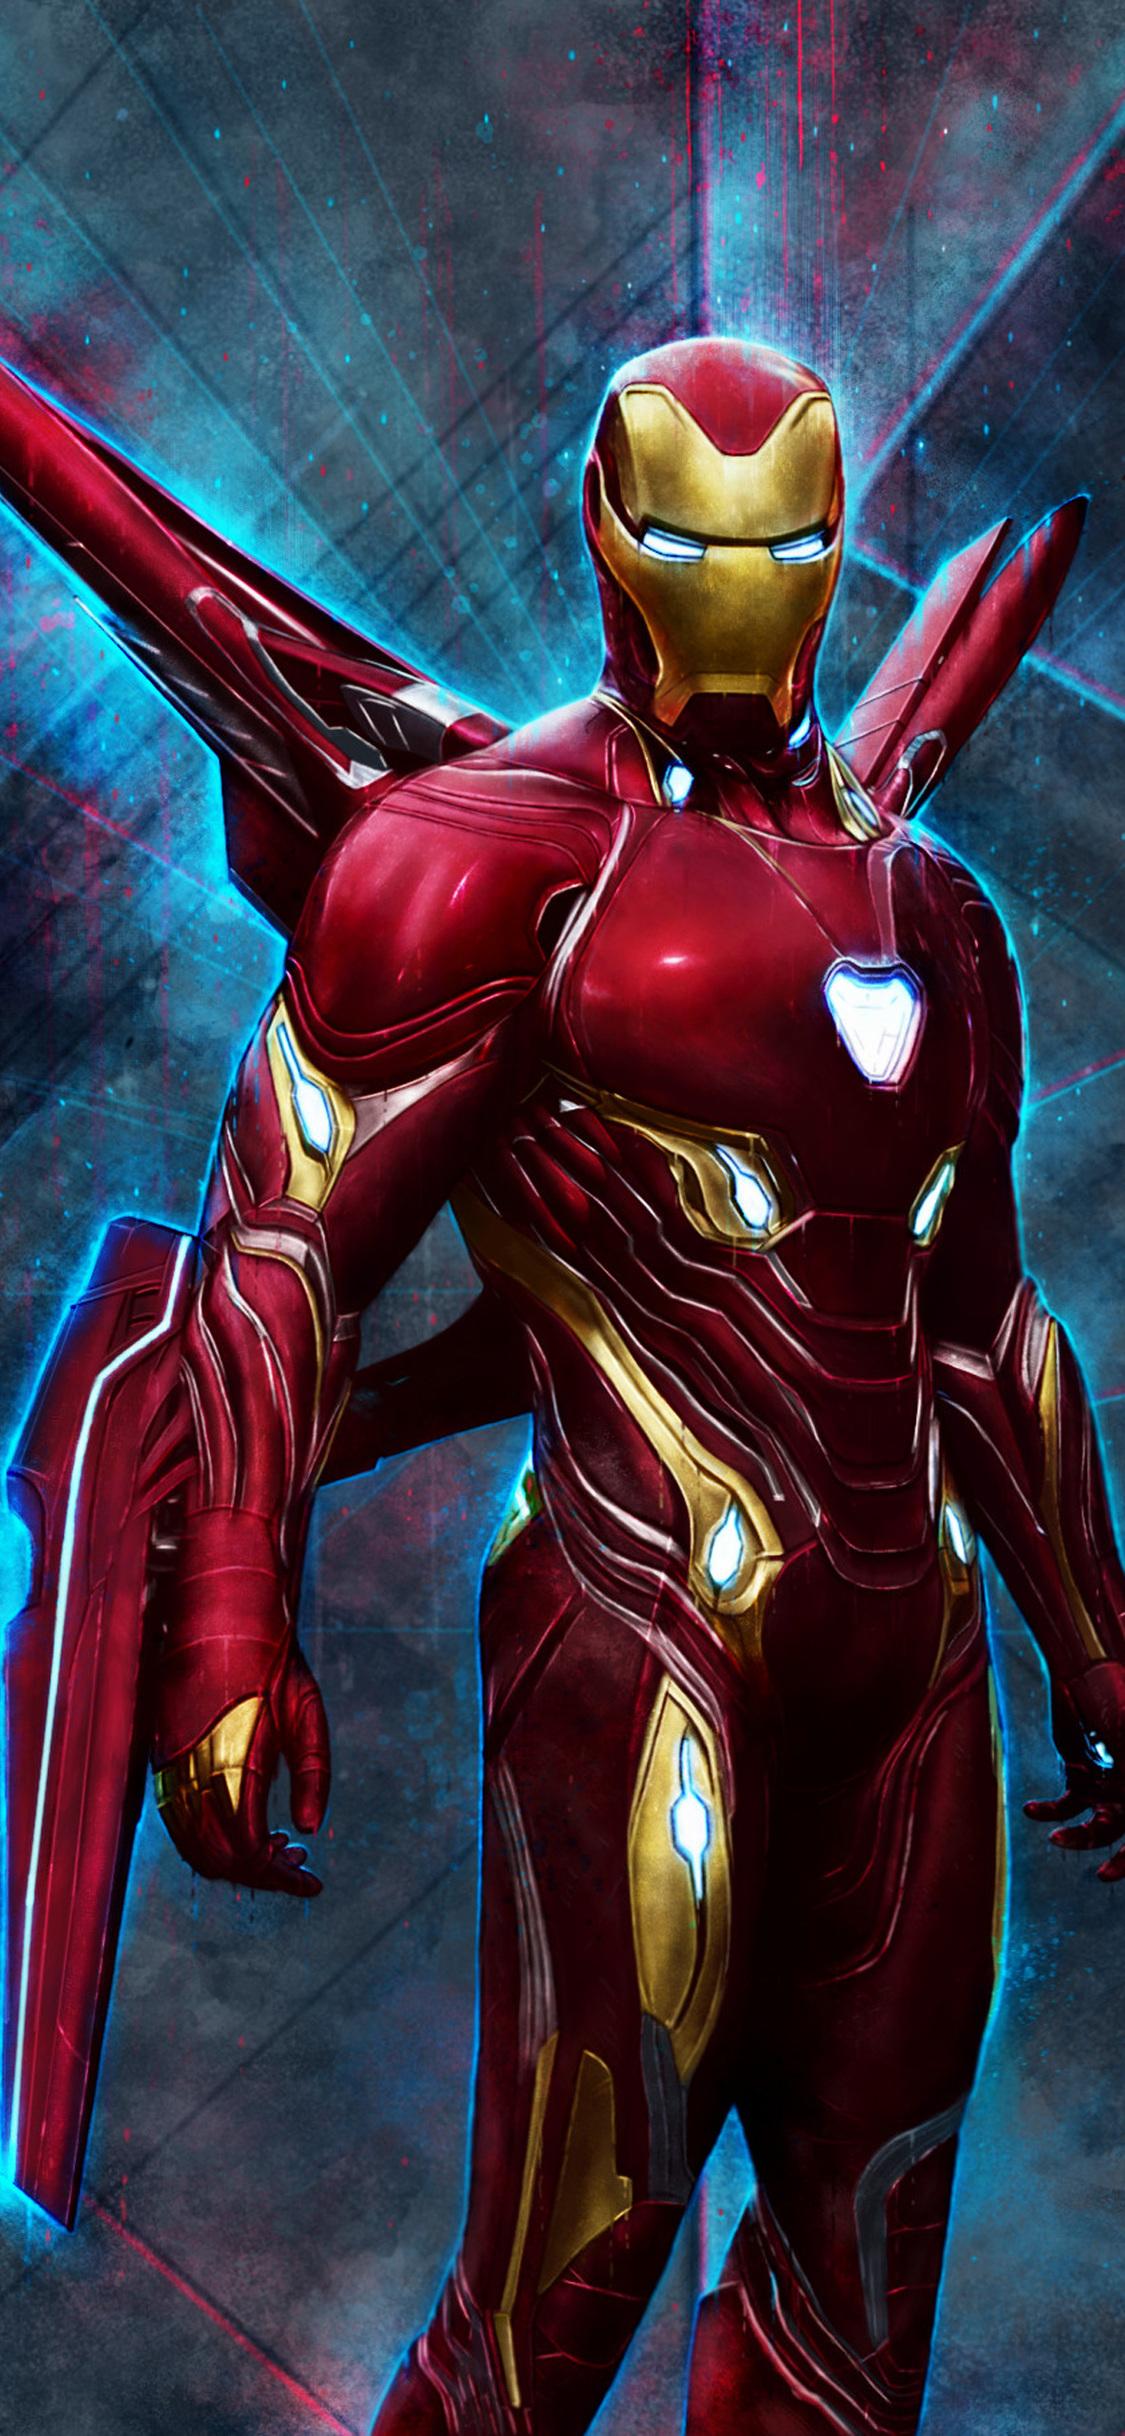 1125x2436 Iron Man Bleeding Edge Armor Iphone Xs Iphone 10 Iphone X